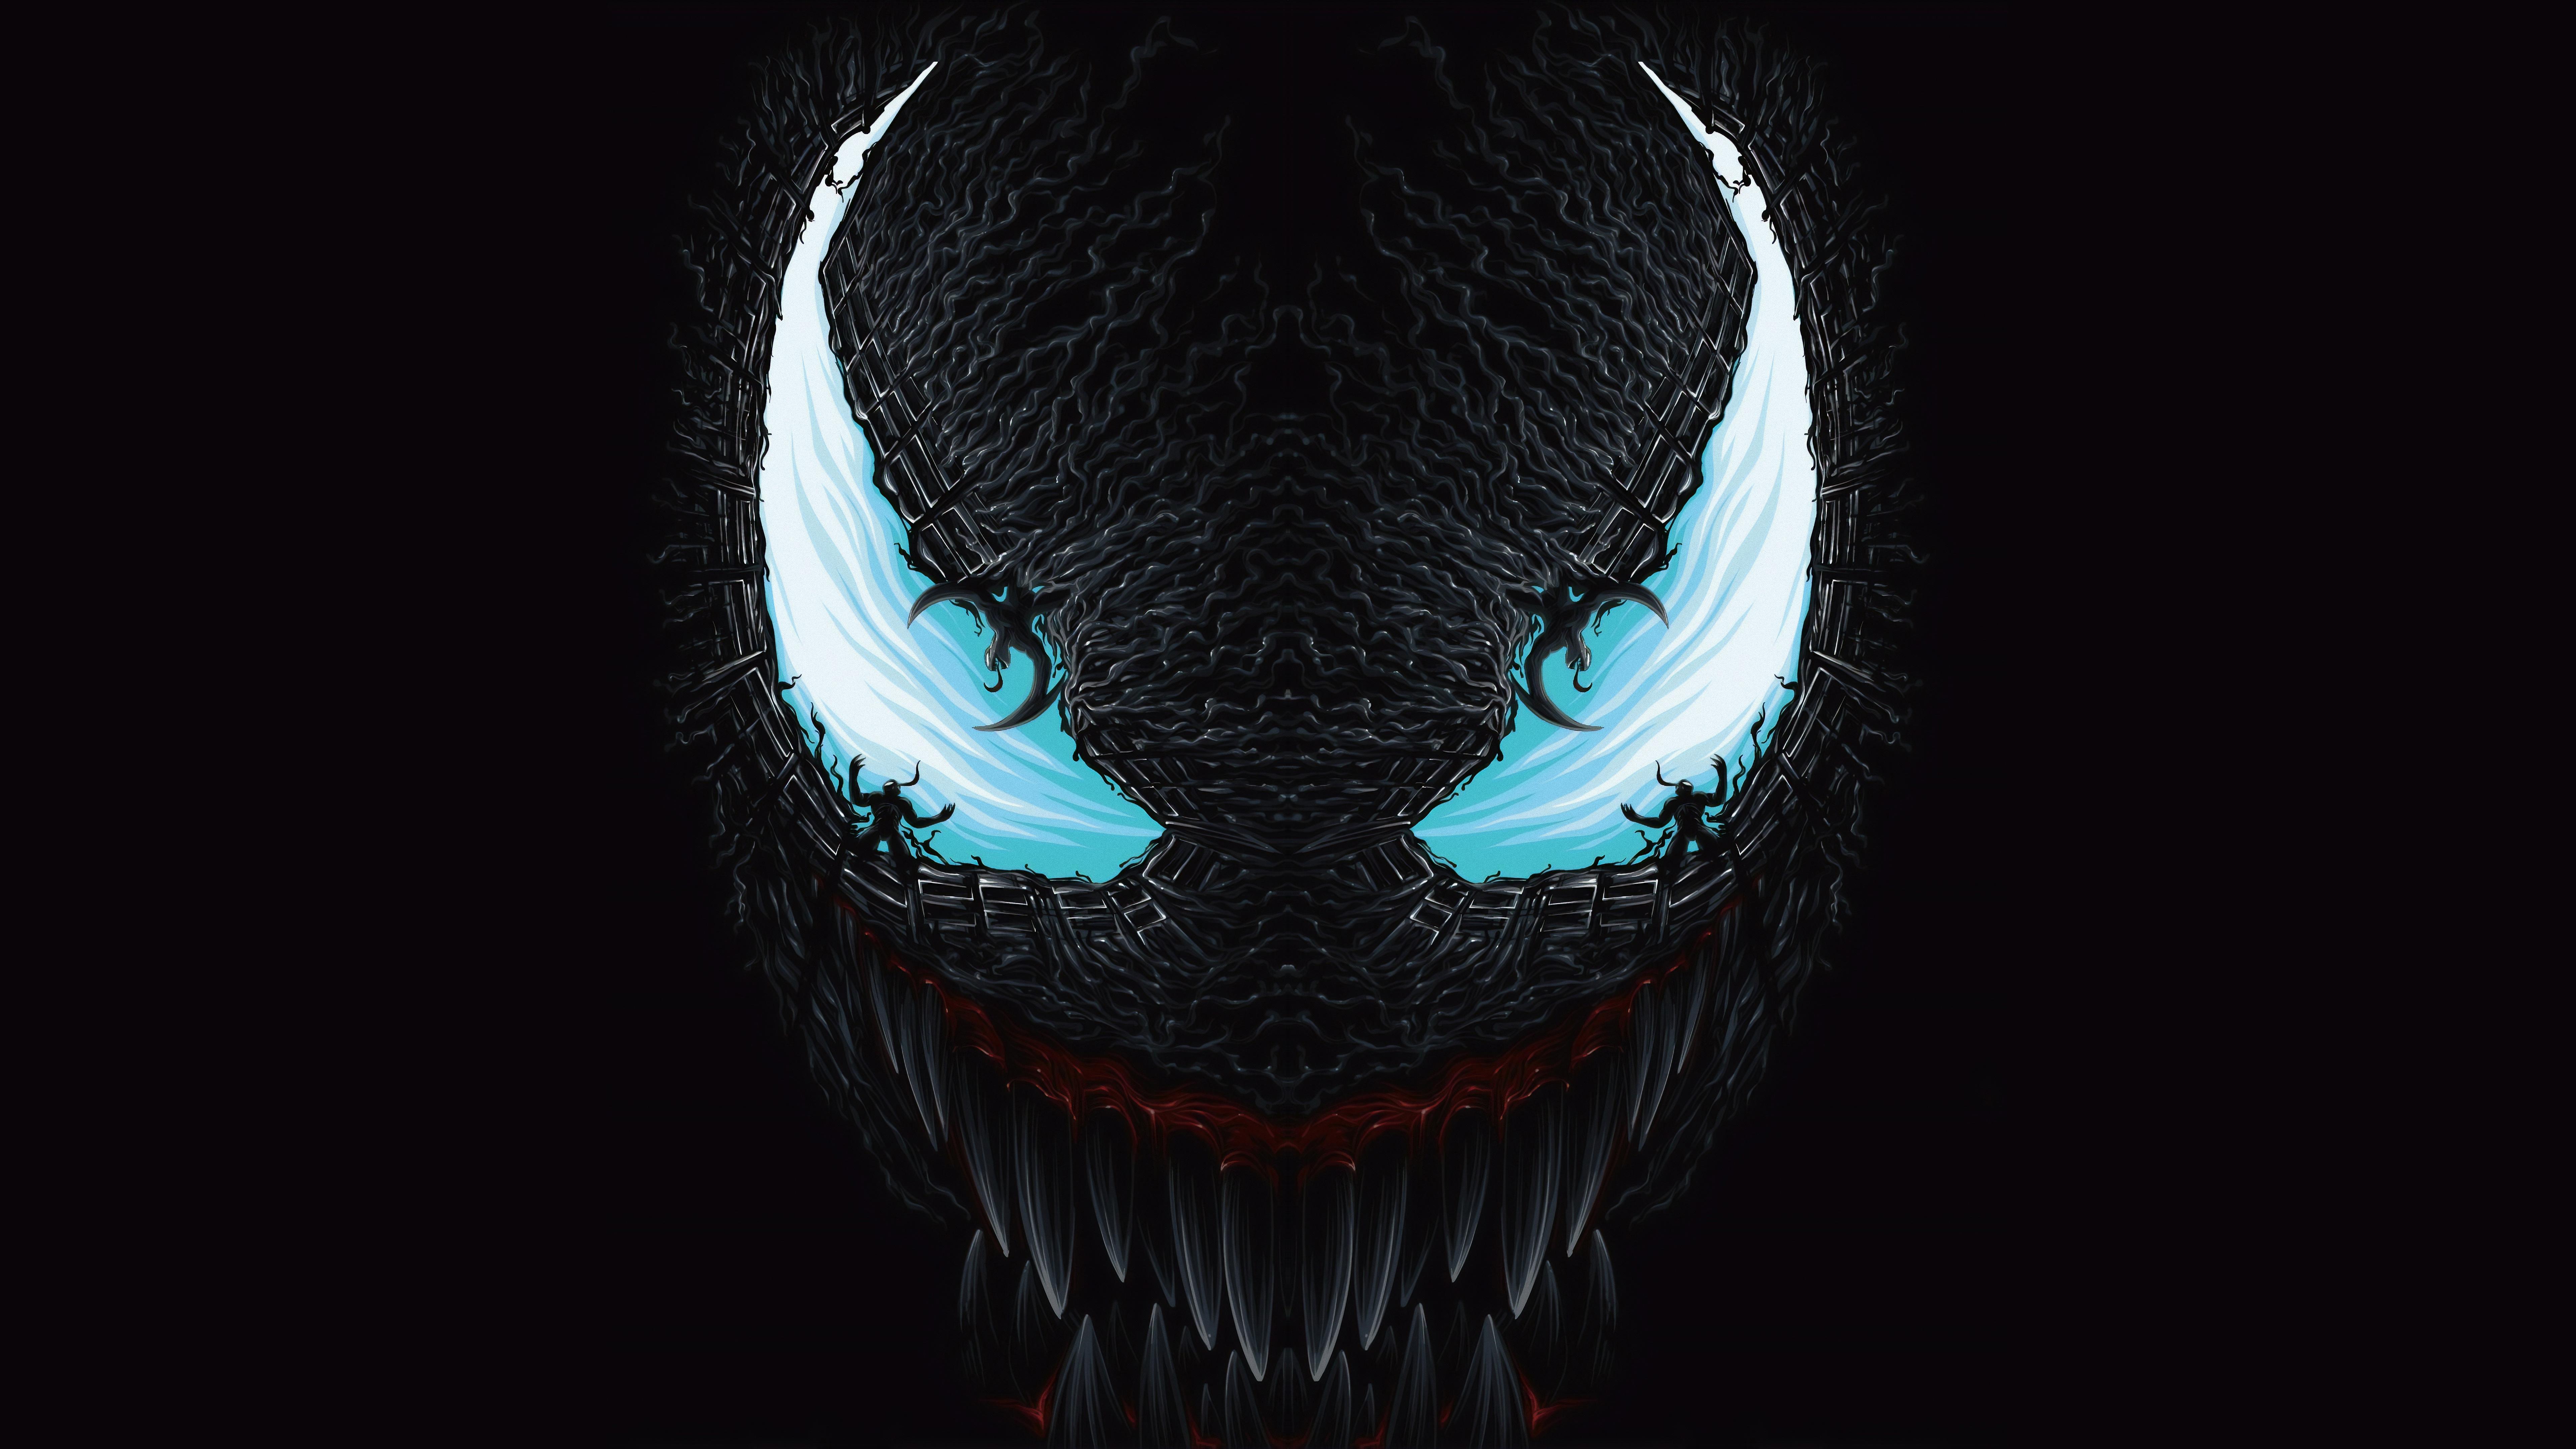 Venom 8k Ultra HD Wallpaper | Background Image | 7680x4320 | ID:980846 - Wallpaper Abyss